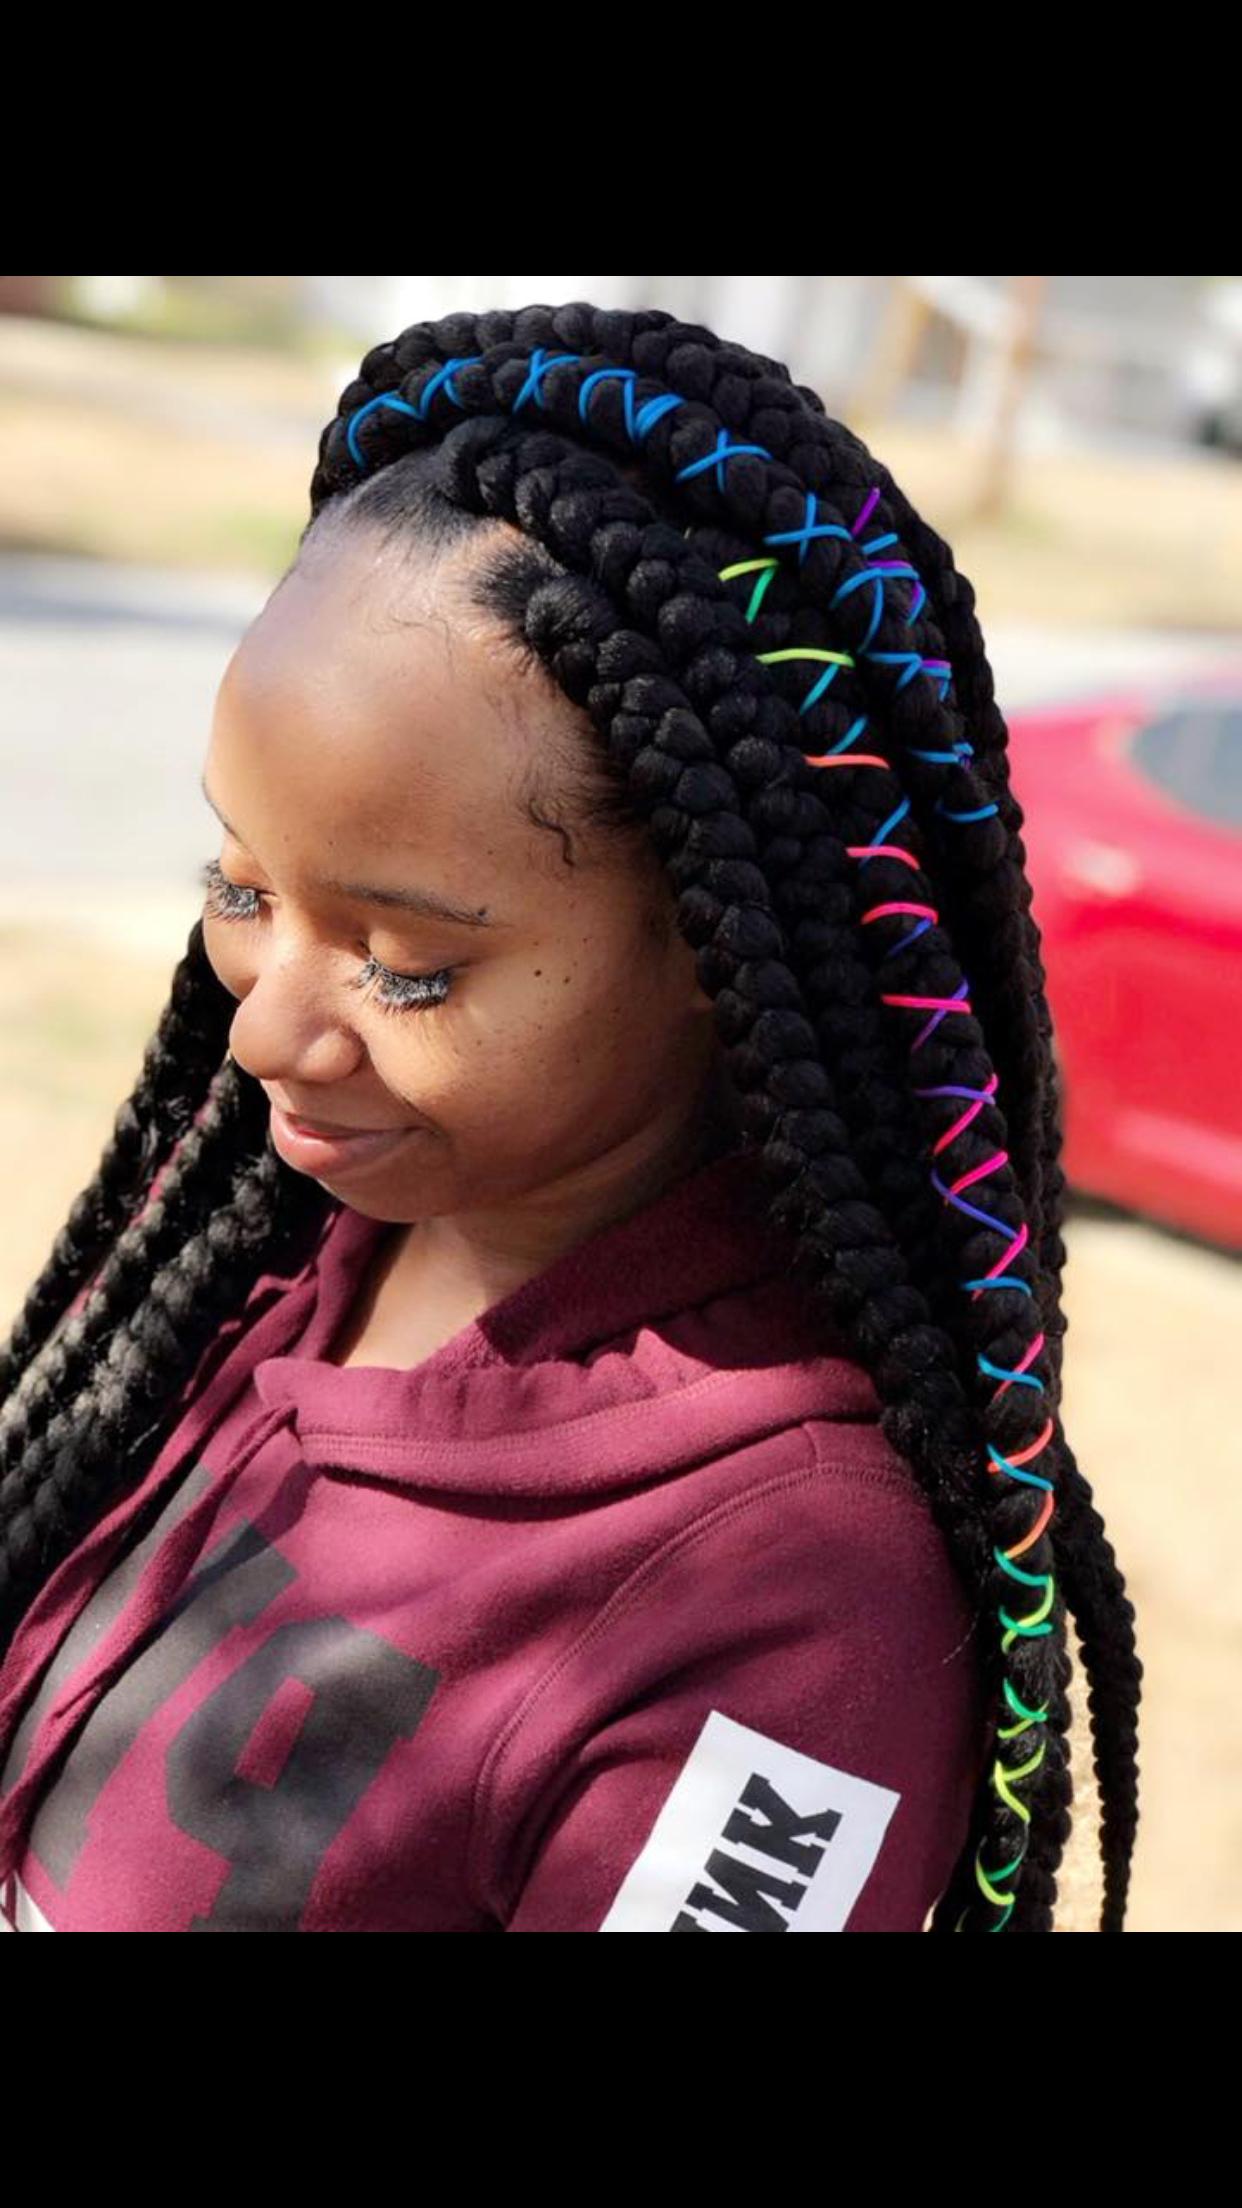 Popular Jumbo Twists Yarn Braid Hairstyles For Fashion : Jumbo Box Braids Crochetbraids Hairrrr Delightful (View 14 of 20)